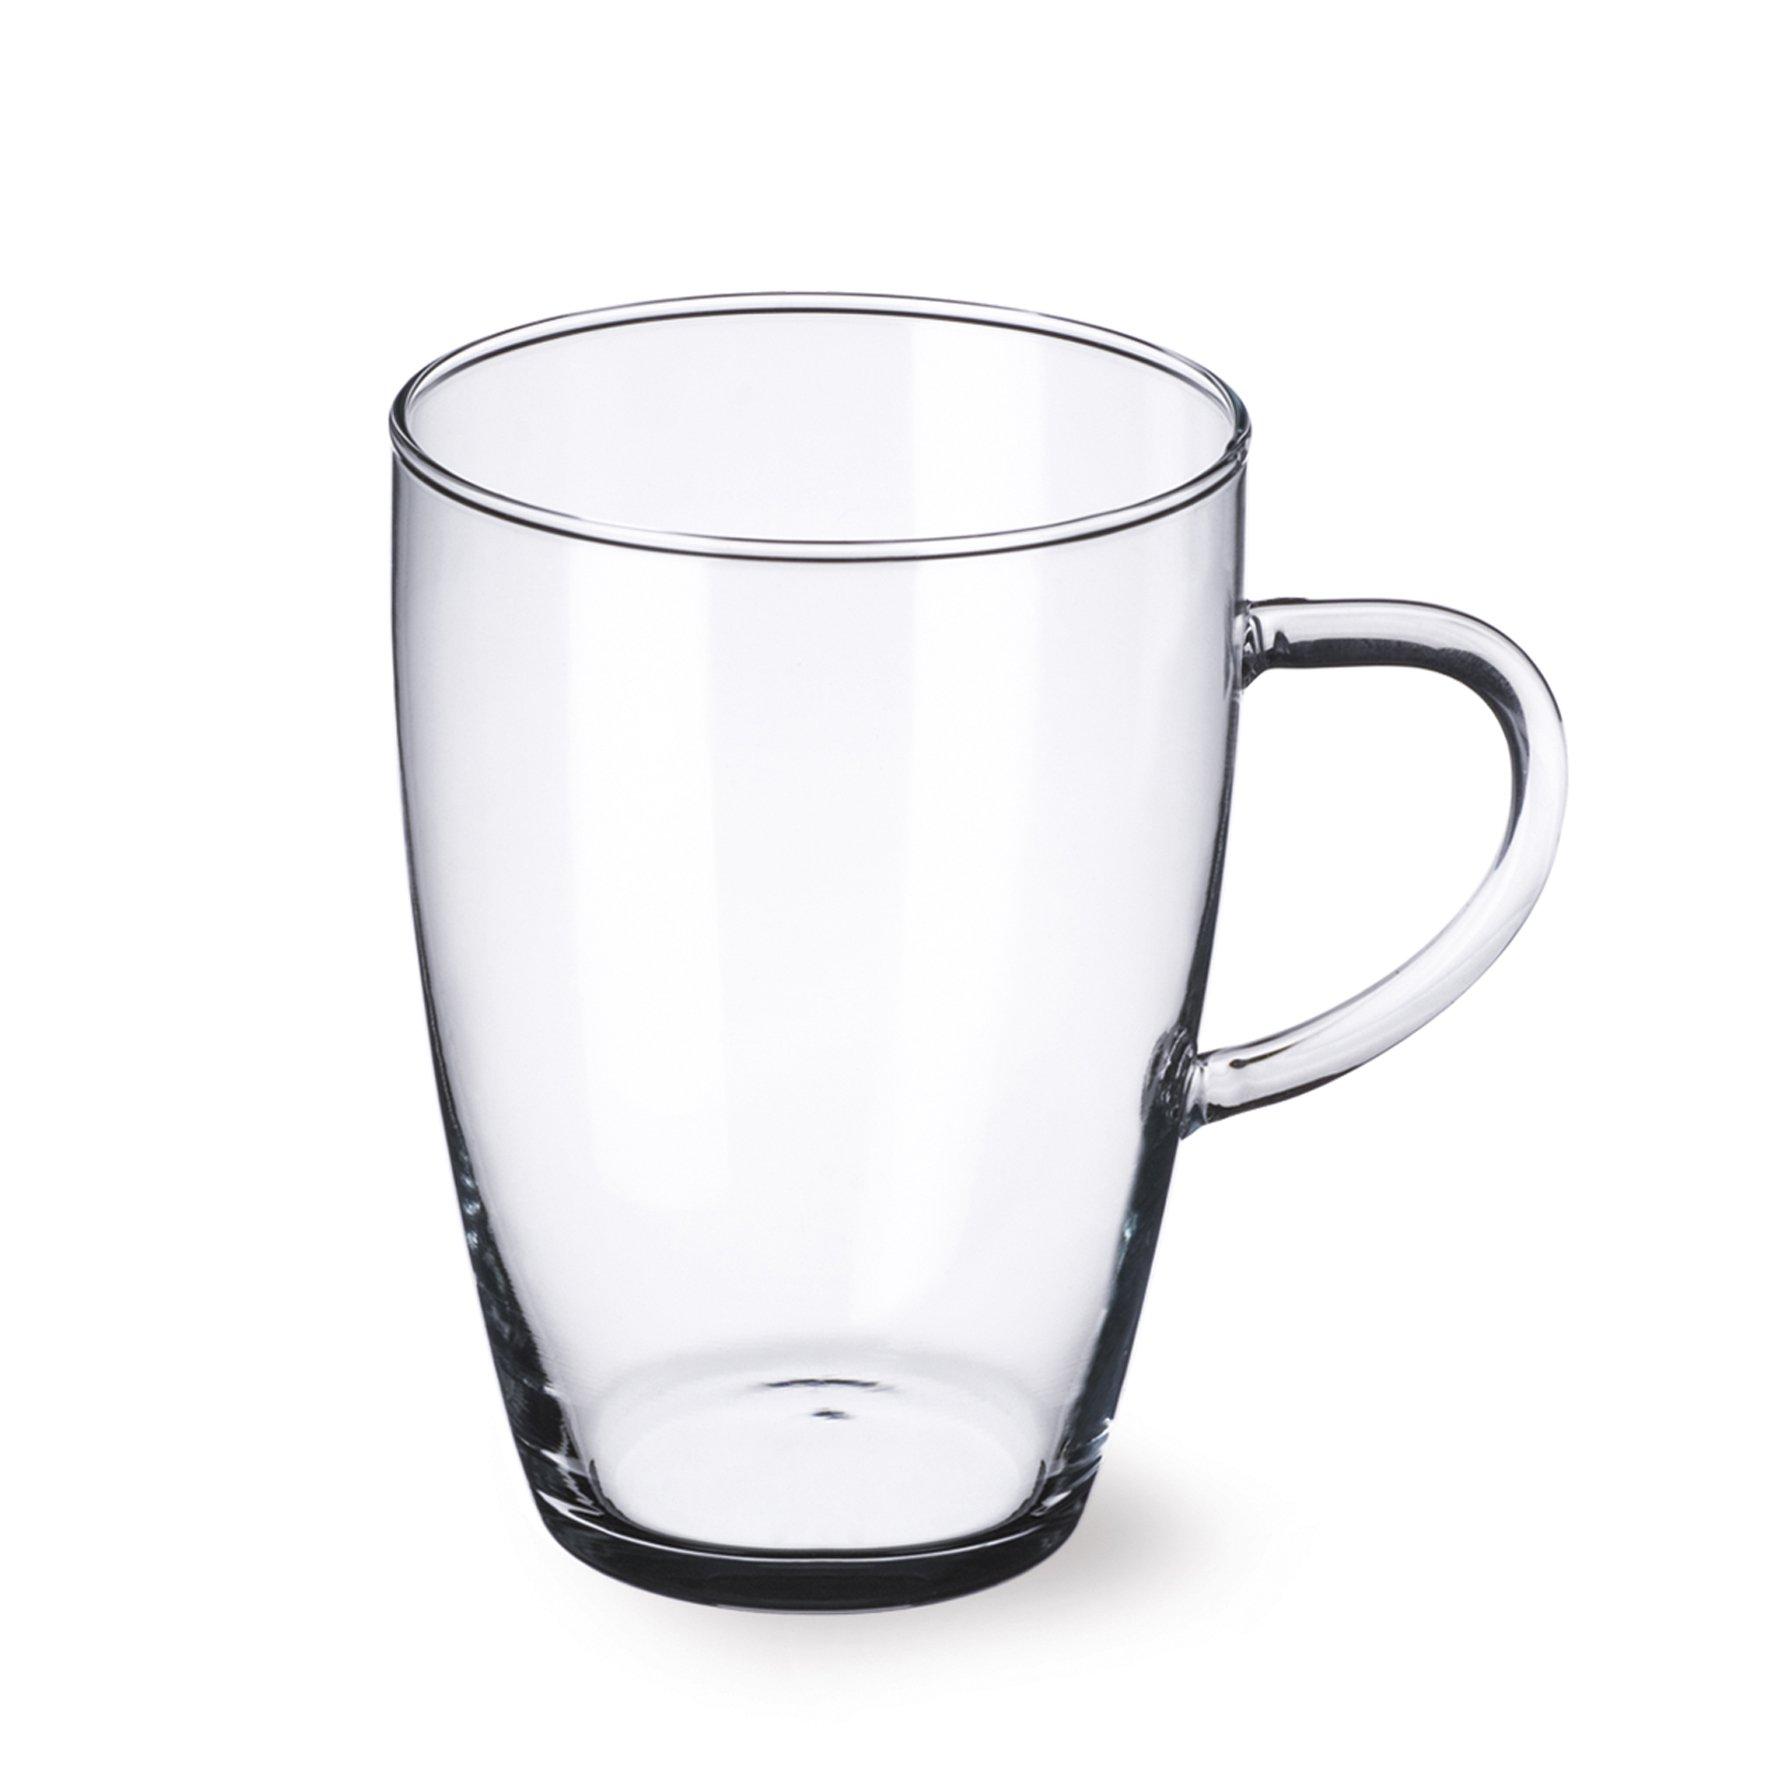 Simax Glassware 2612/4 Lyra Mugs, 12-Ounce, Set of 4